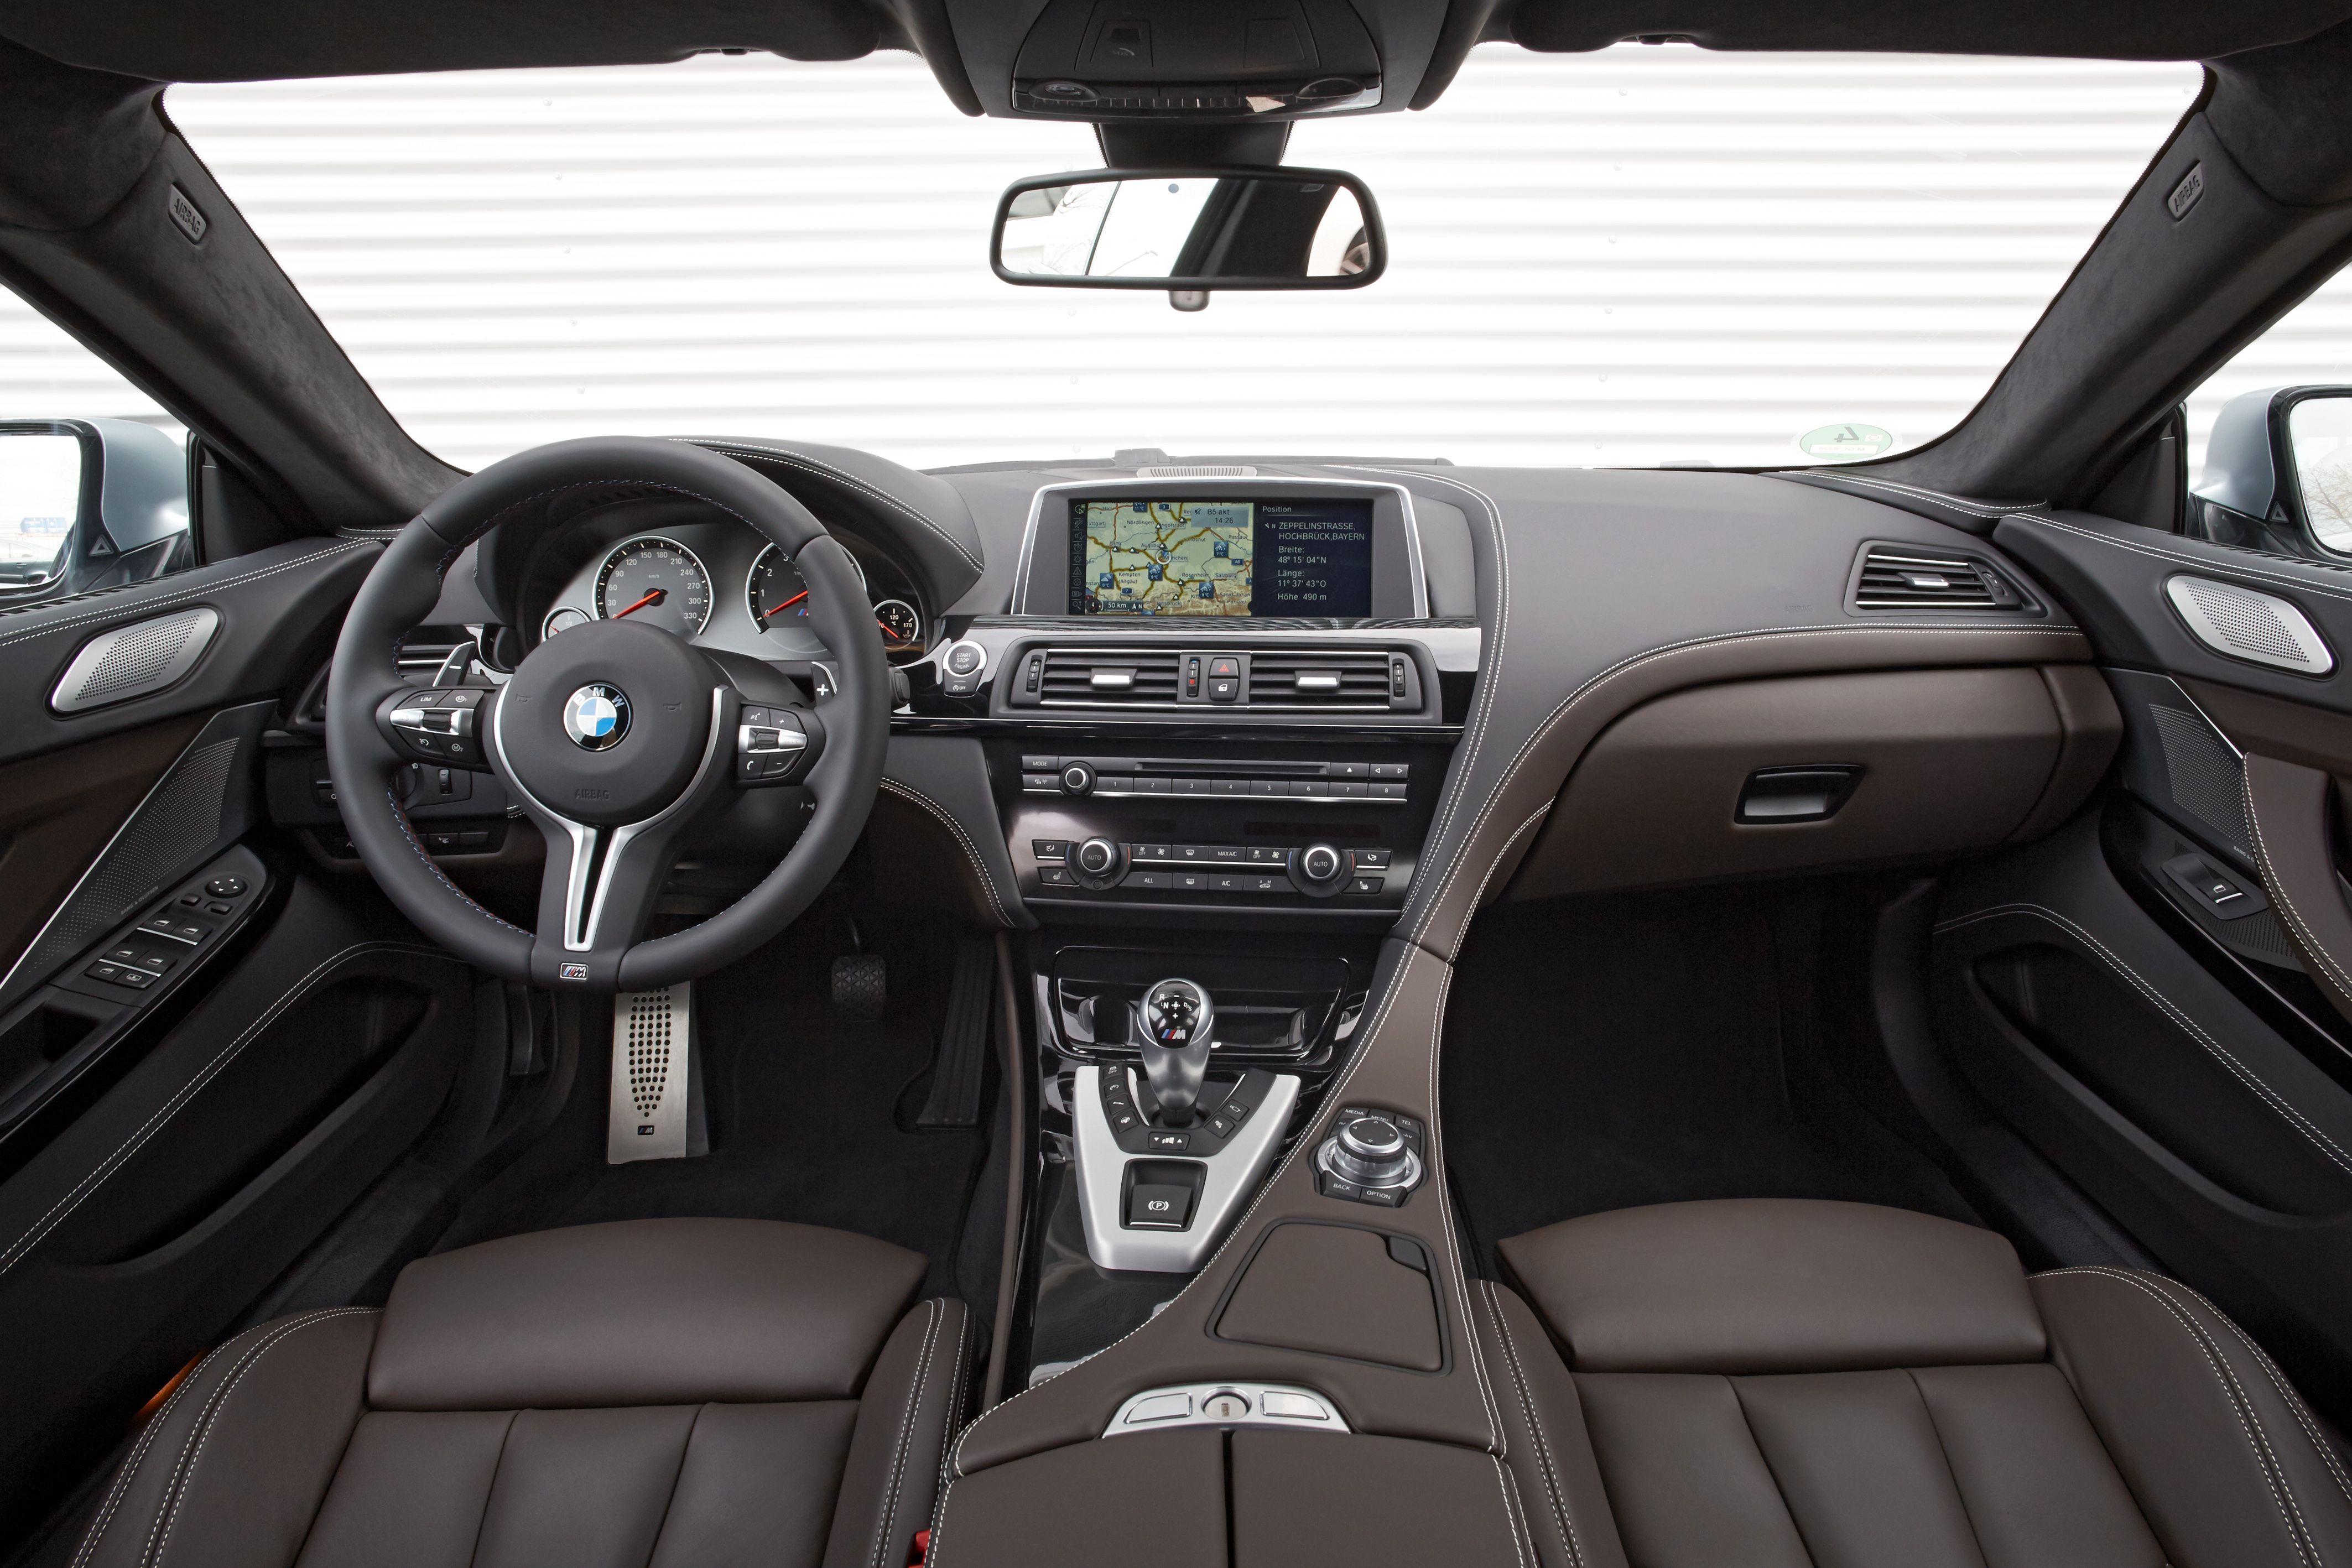 Interiors Bmw M6 Gran Coupe Bmw M6 Bmw X5 Top 10 Luxury Cars